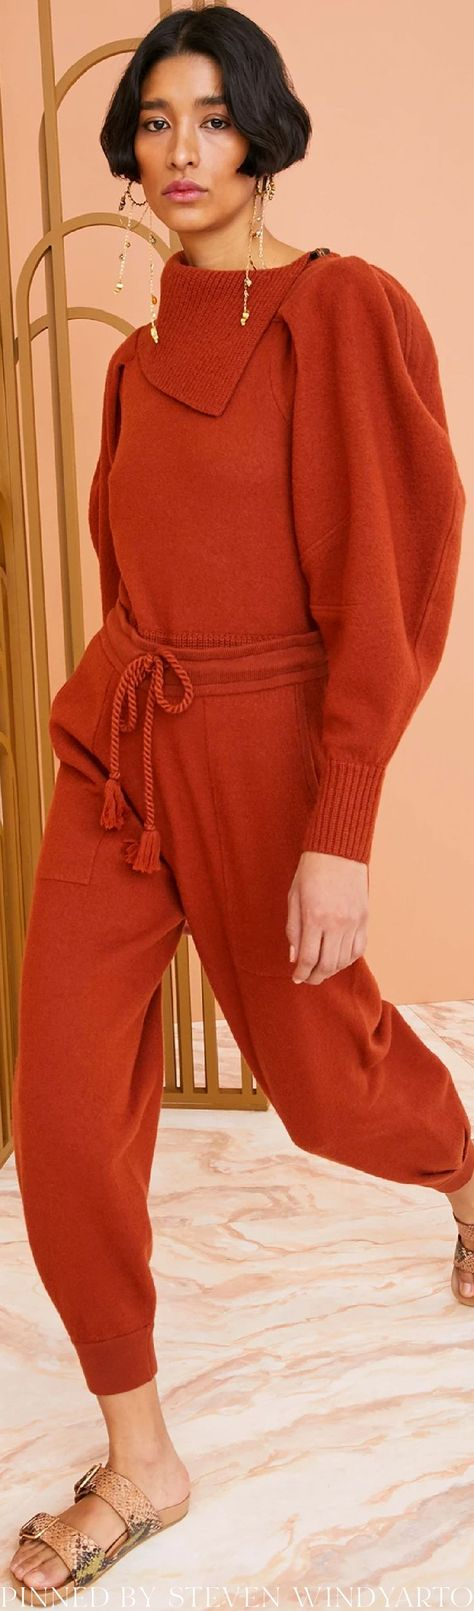 Ulla Johnson Fall 2021 Lookbook #fall2021 #fw21 #womenswear #ullajohnson